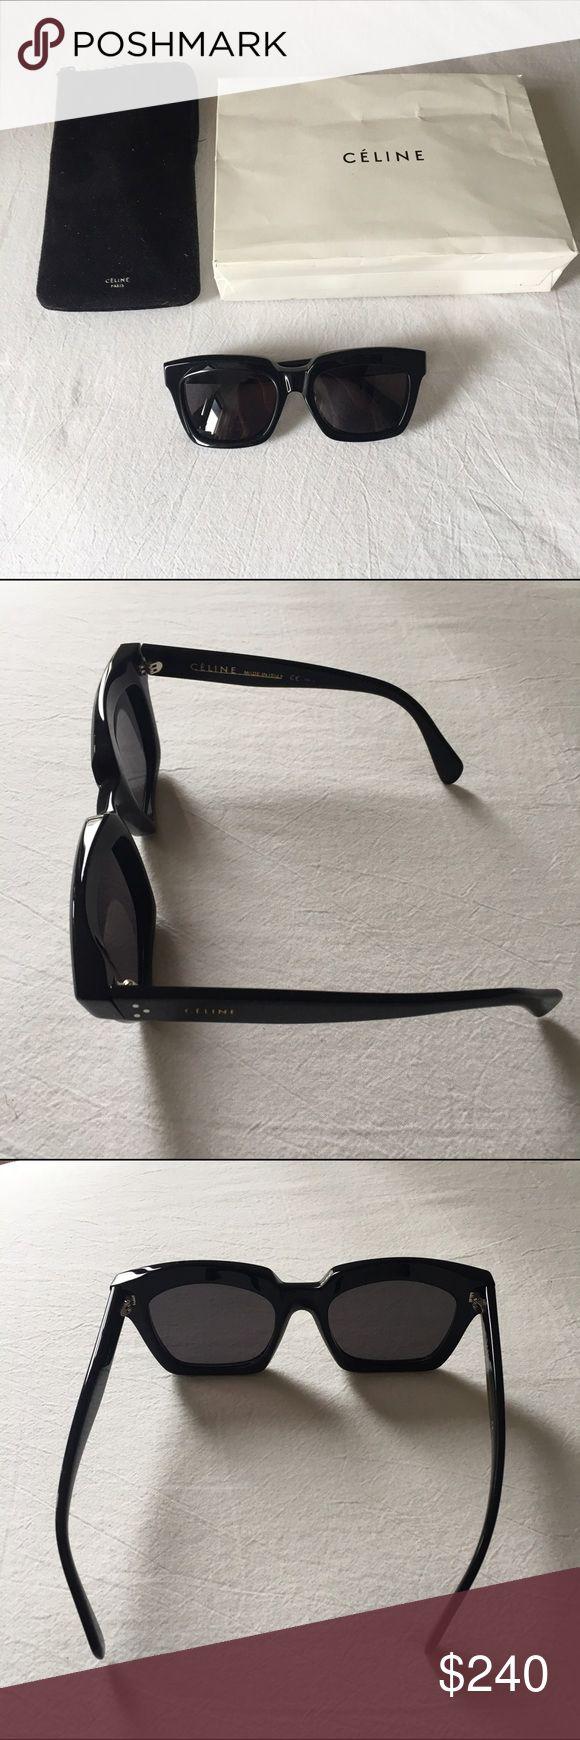 5f3a1a21ce1f celine traveller sunglasses